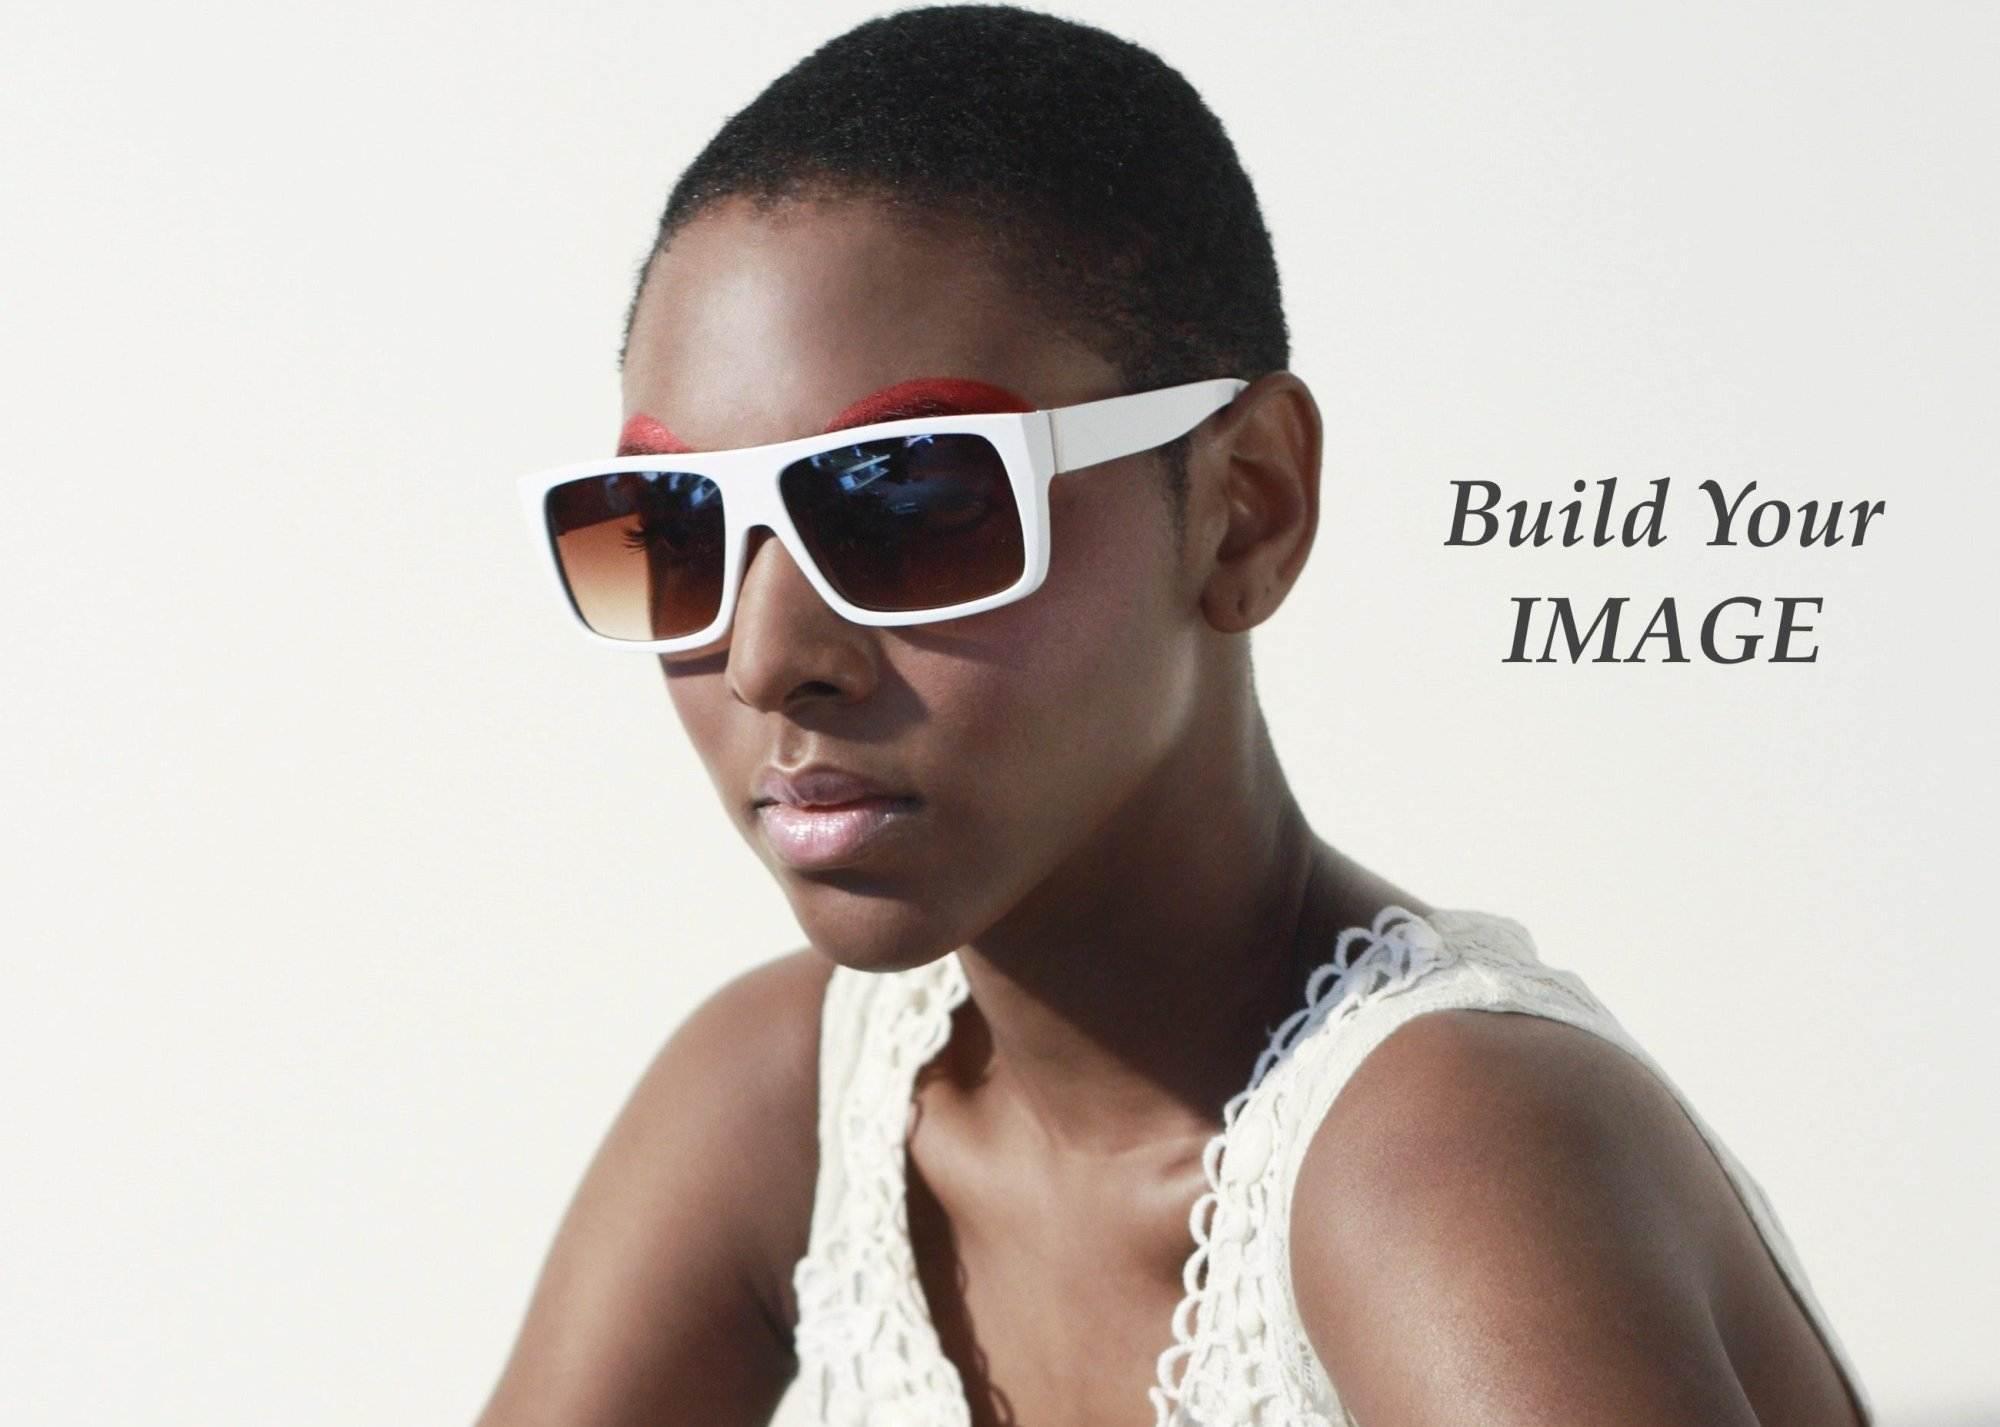 Brand Image Building Persoanl Stylist